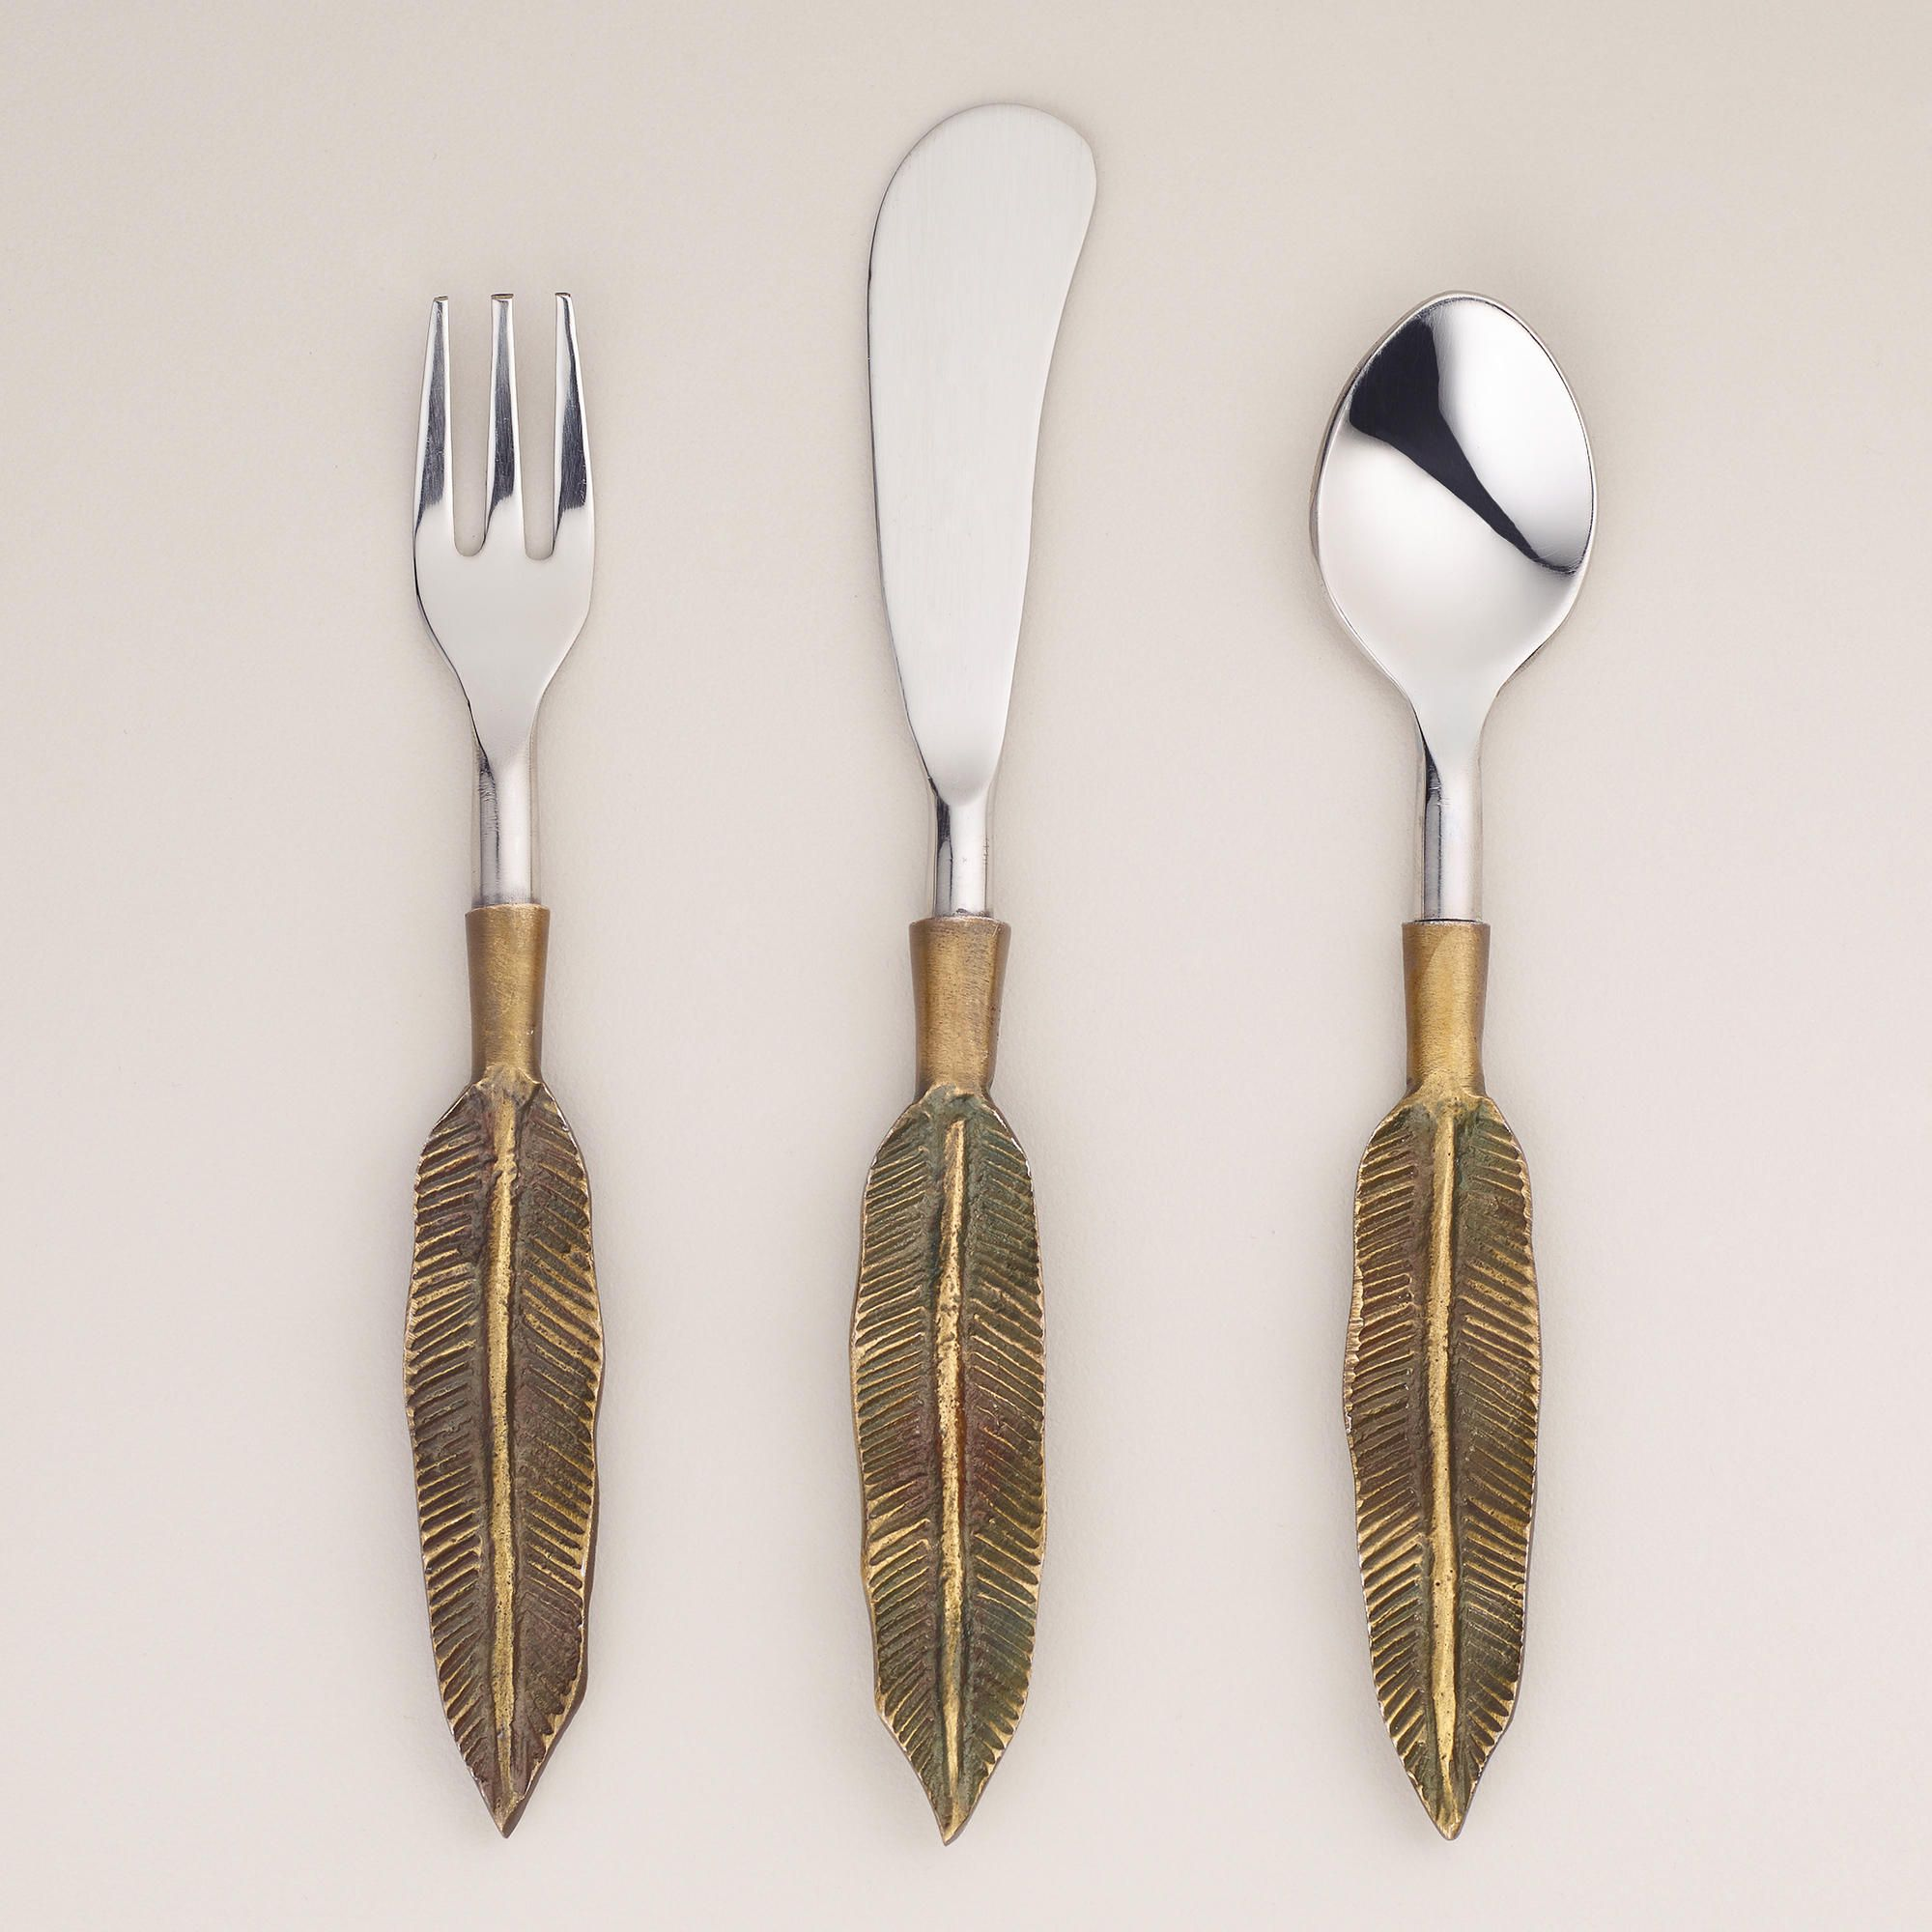 Feather cocktail flatware collection world market kitchen accesories pinterest flatware - Almoco flatware ...